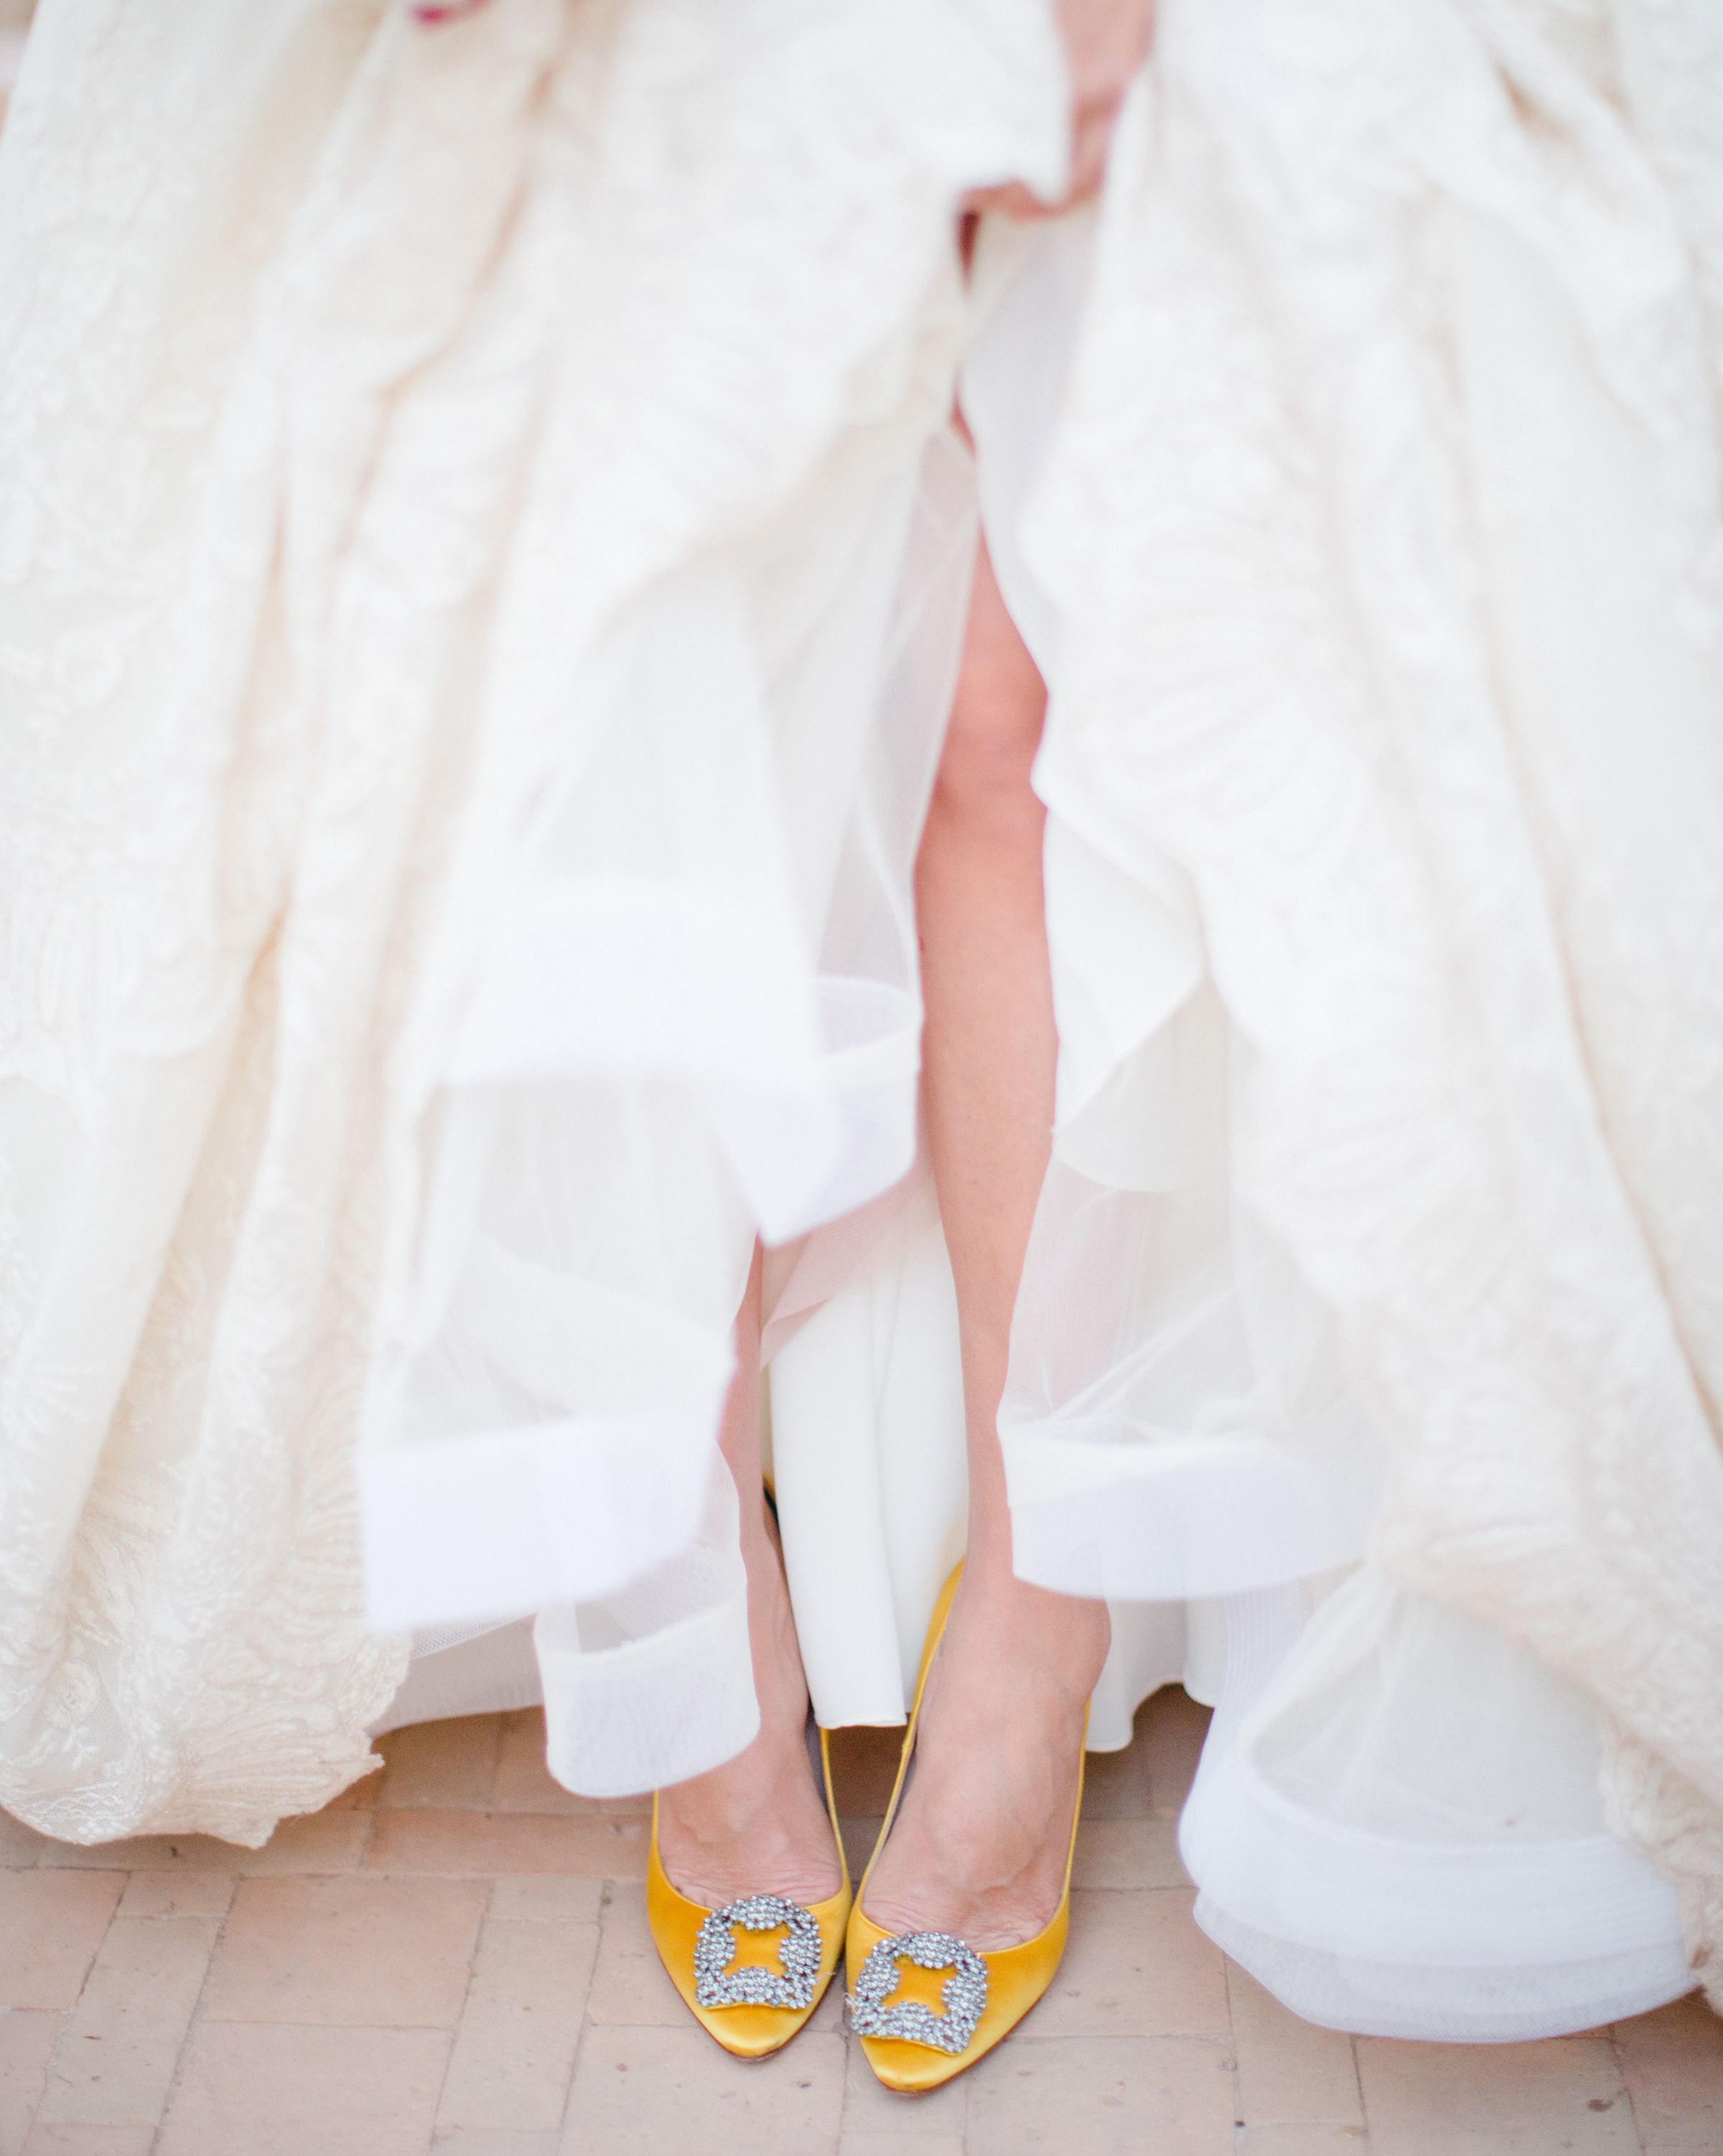 federica-tommaso-wedding-shoes-102-s112330-1015.jpg